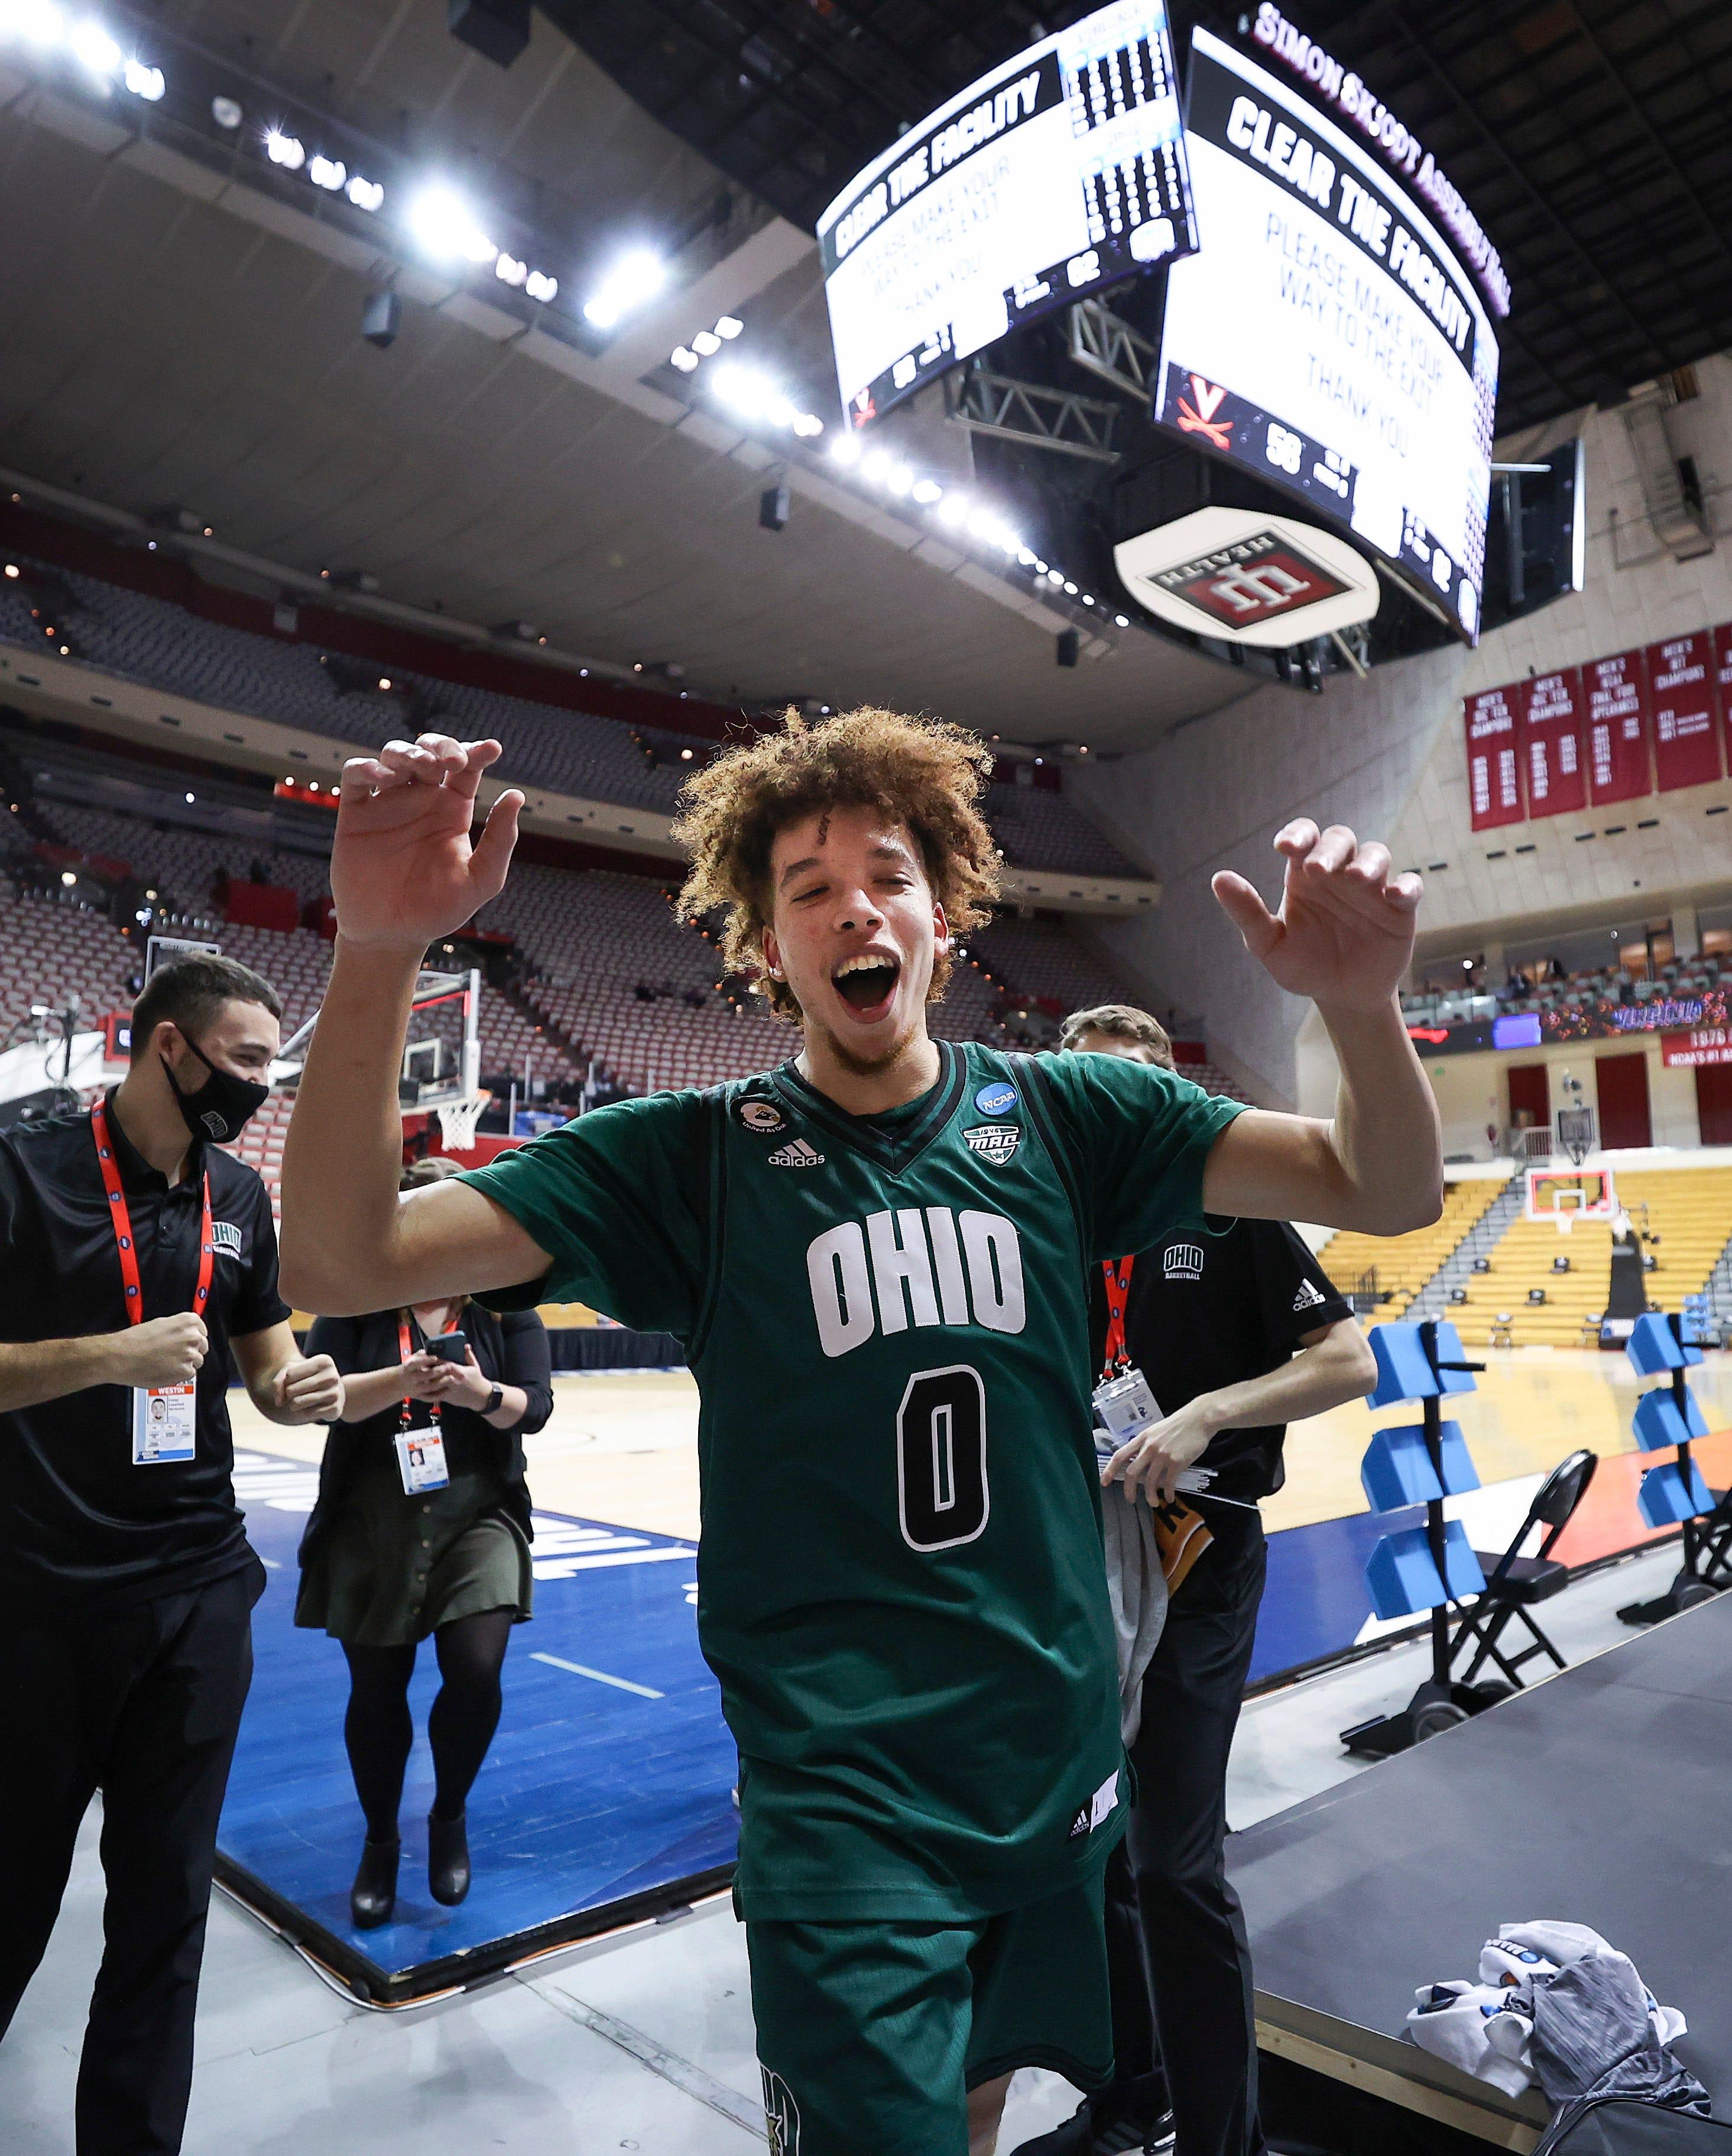 His life is a movie : Meet Jason Preston, Ohio University s unlikely star who led the Bobcats past Virginia